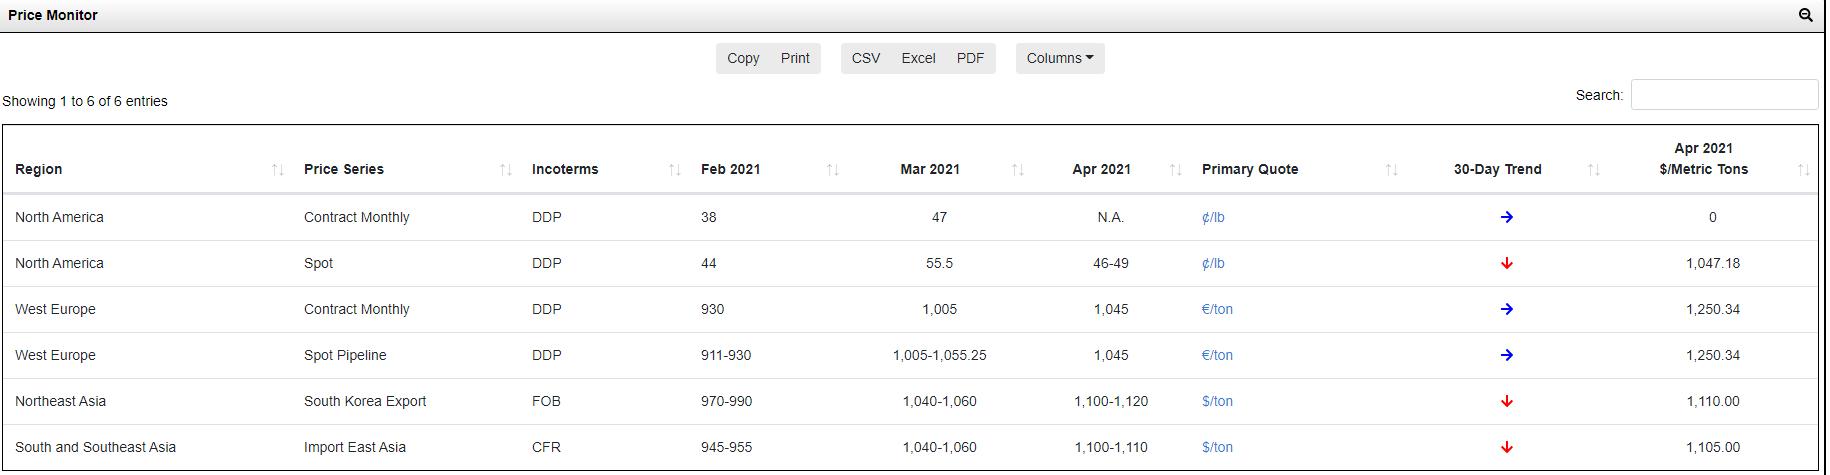 Forecast price monitor